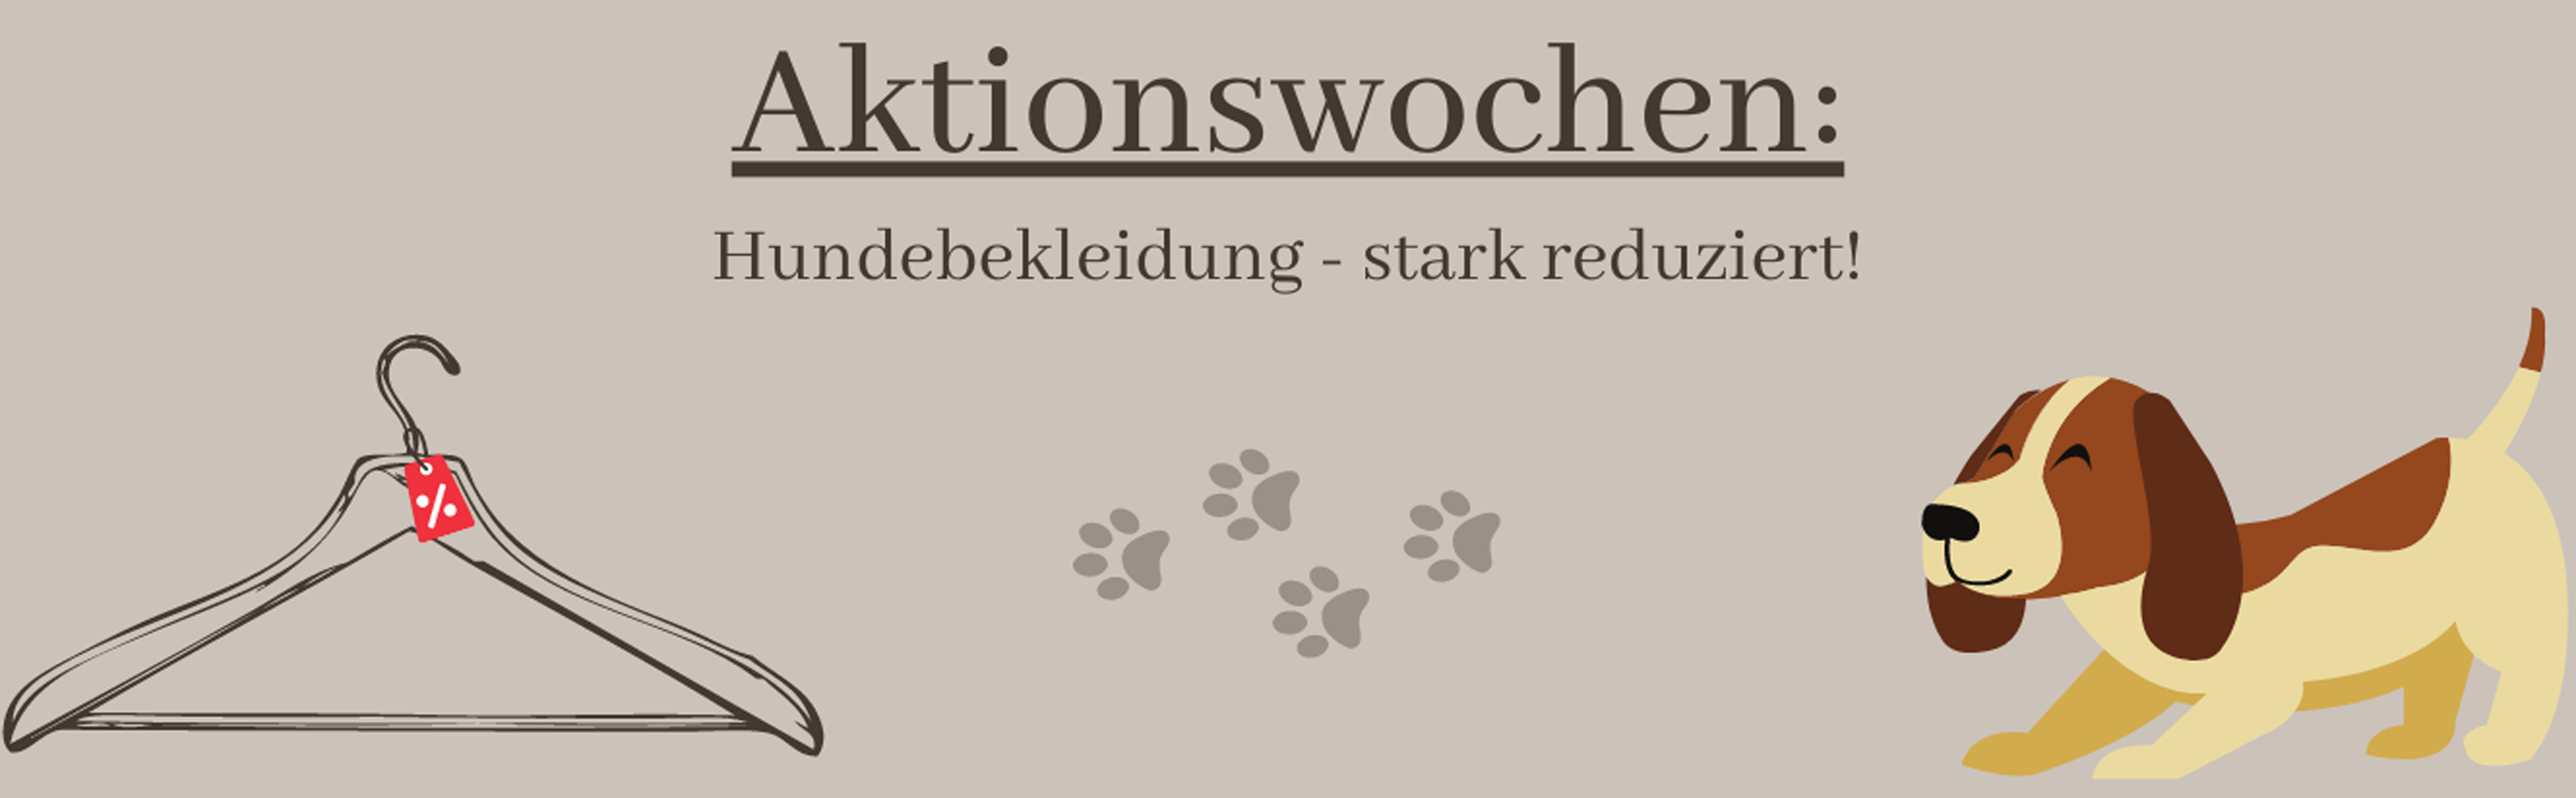 Aktionswochen Hundebekleidung